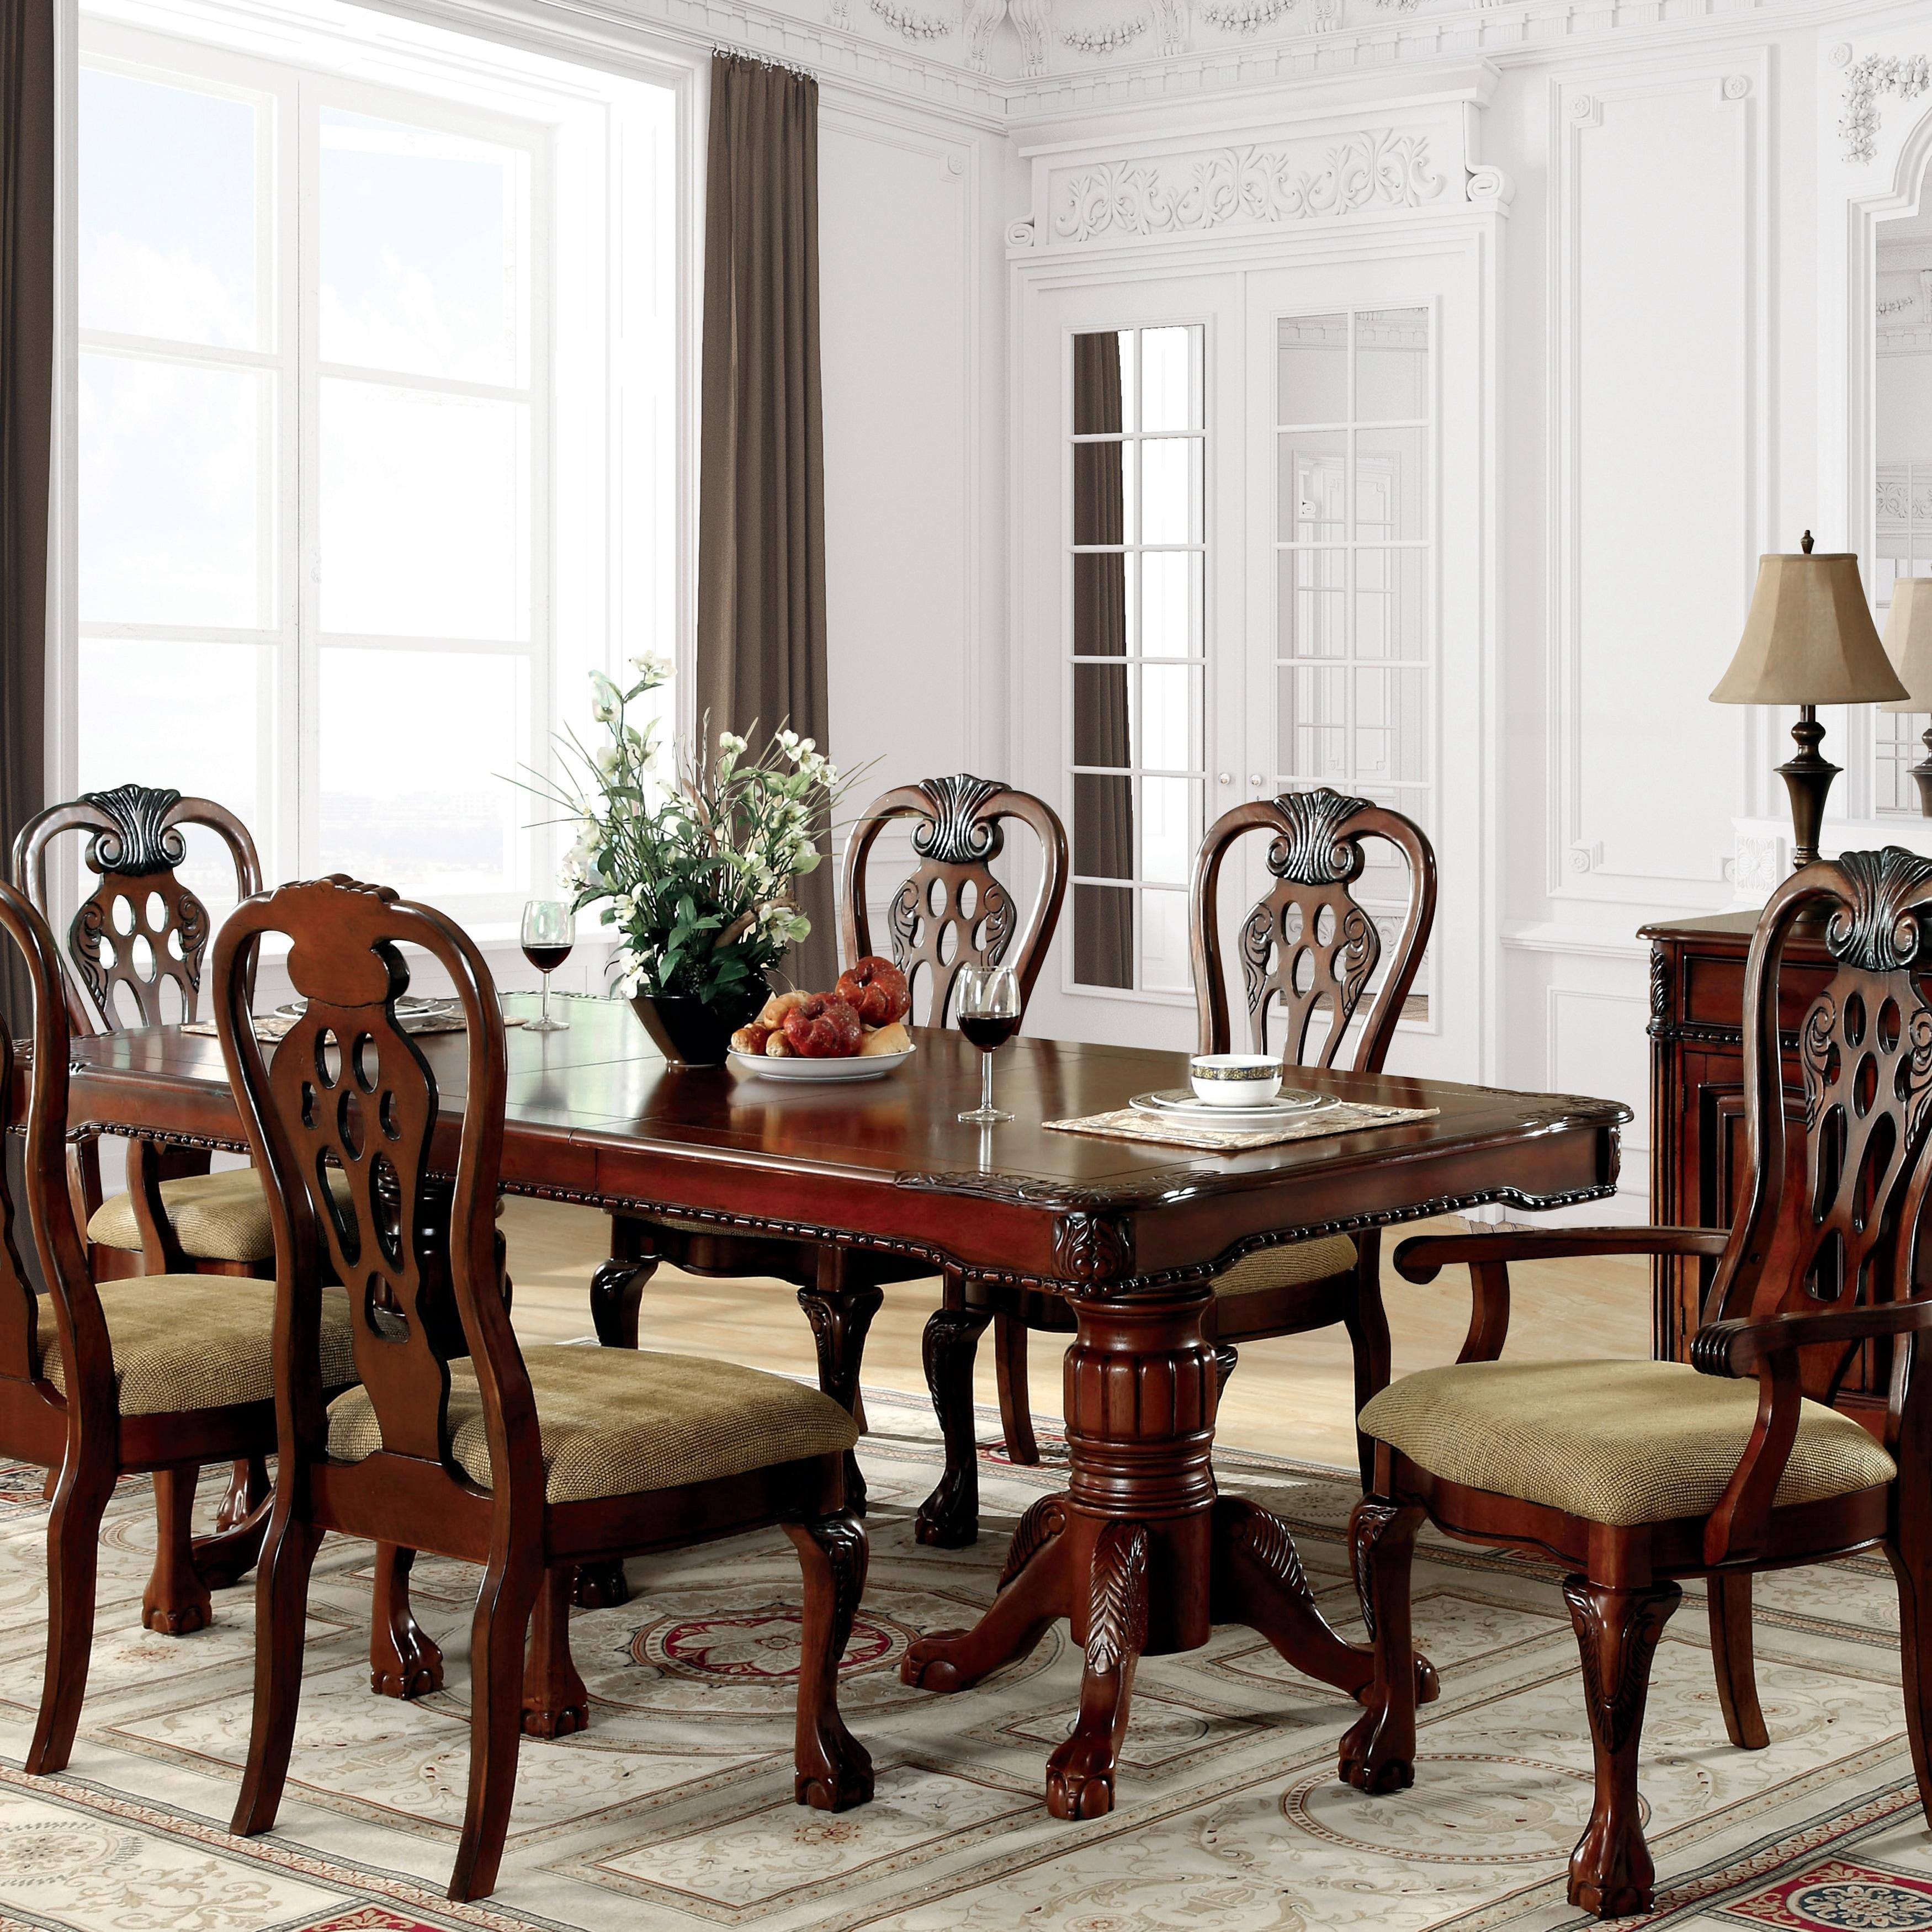 Furniture Of America Harper 7 Piece Formal Cherry Dining Set Overstock 20831060